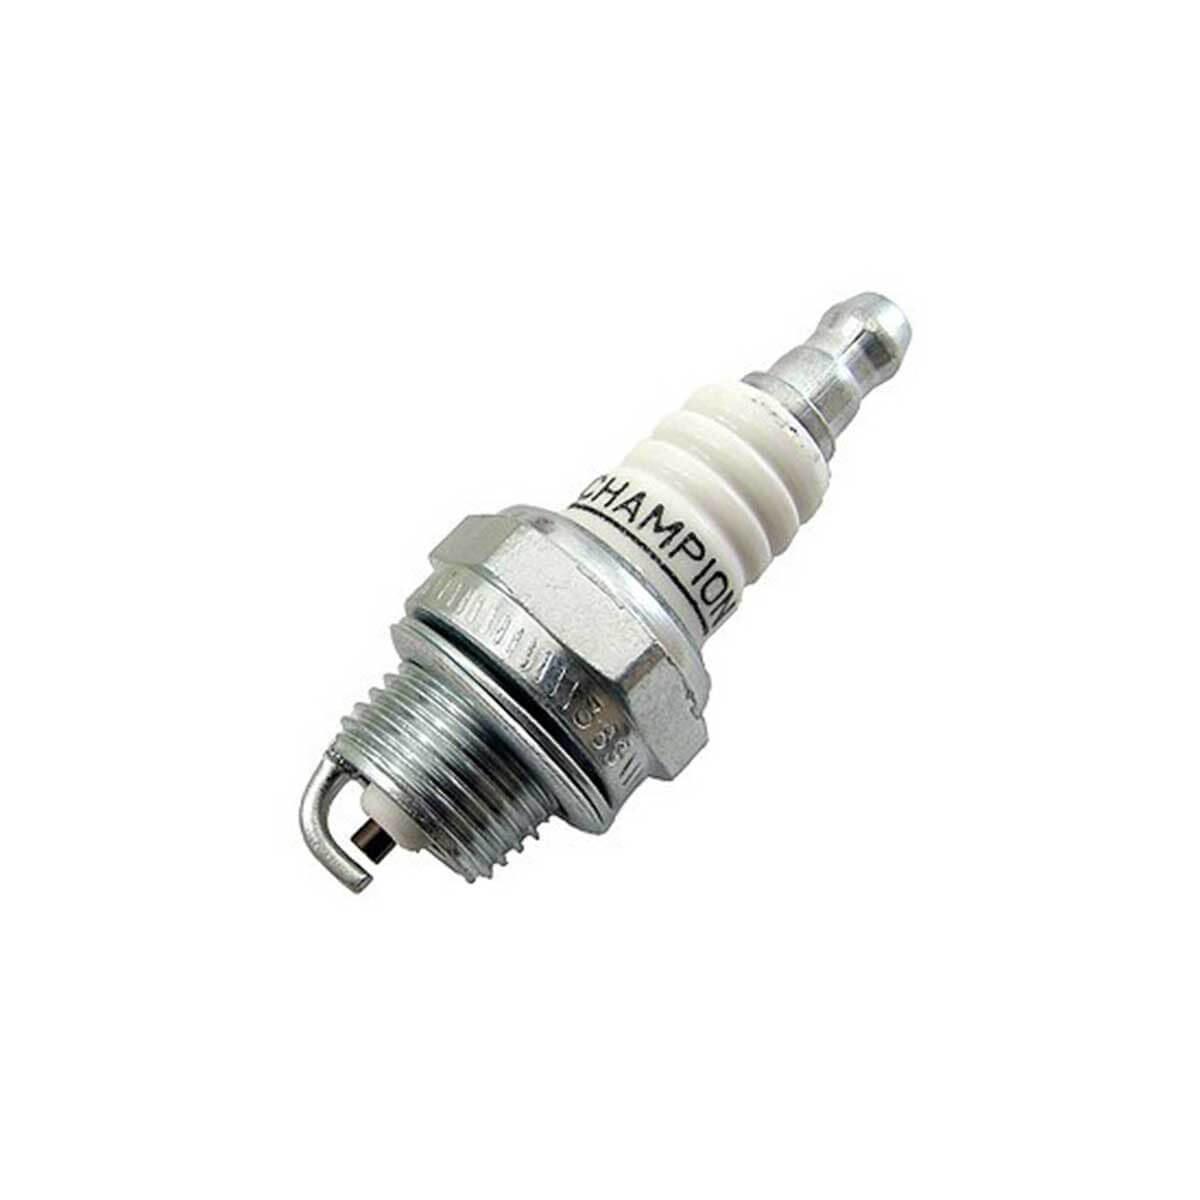 503235109 Champion RCJ6Y Spark plug